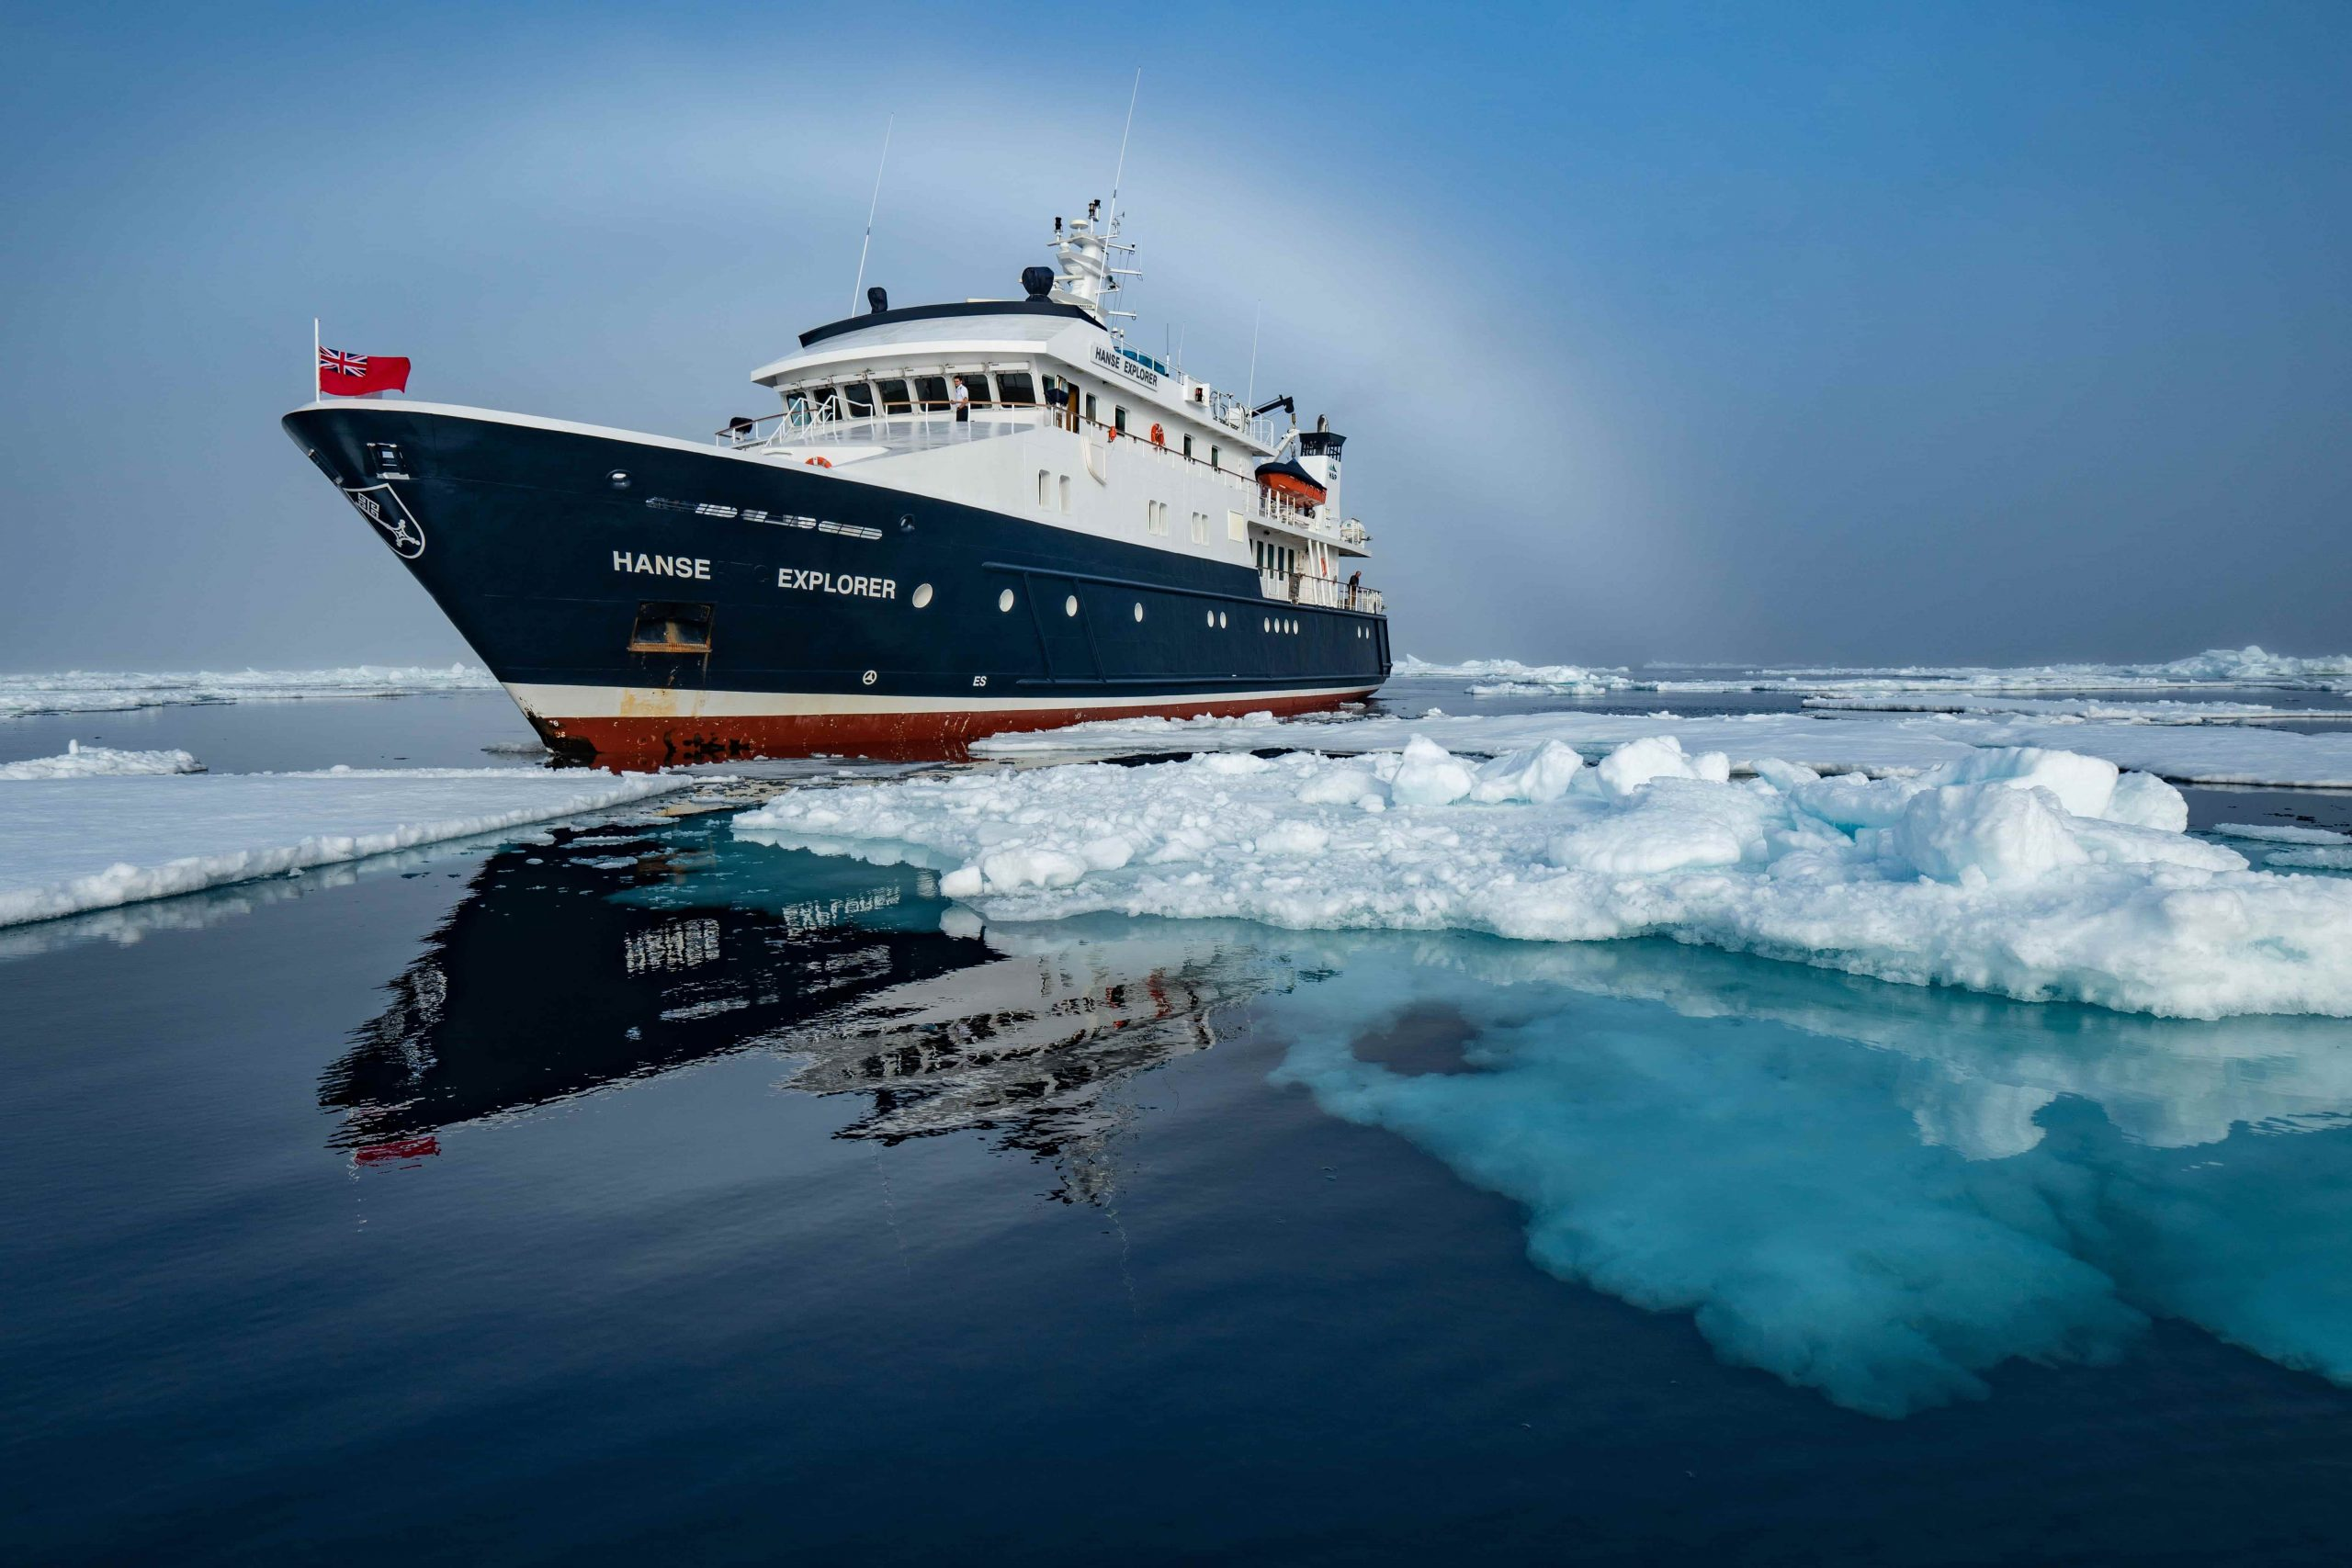 Superyacht Hanse Explorer in Ice